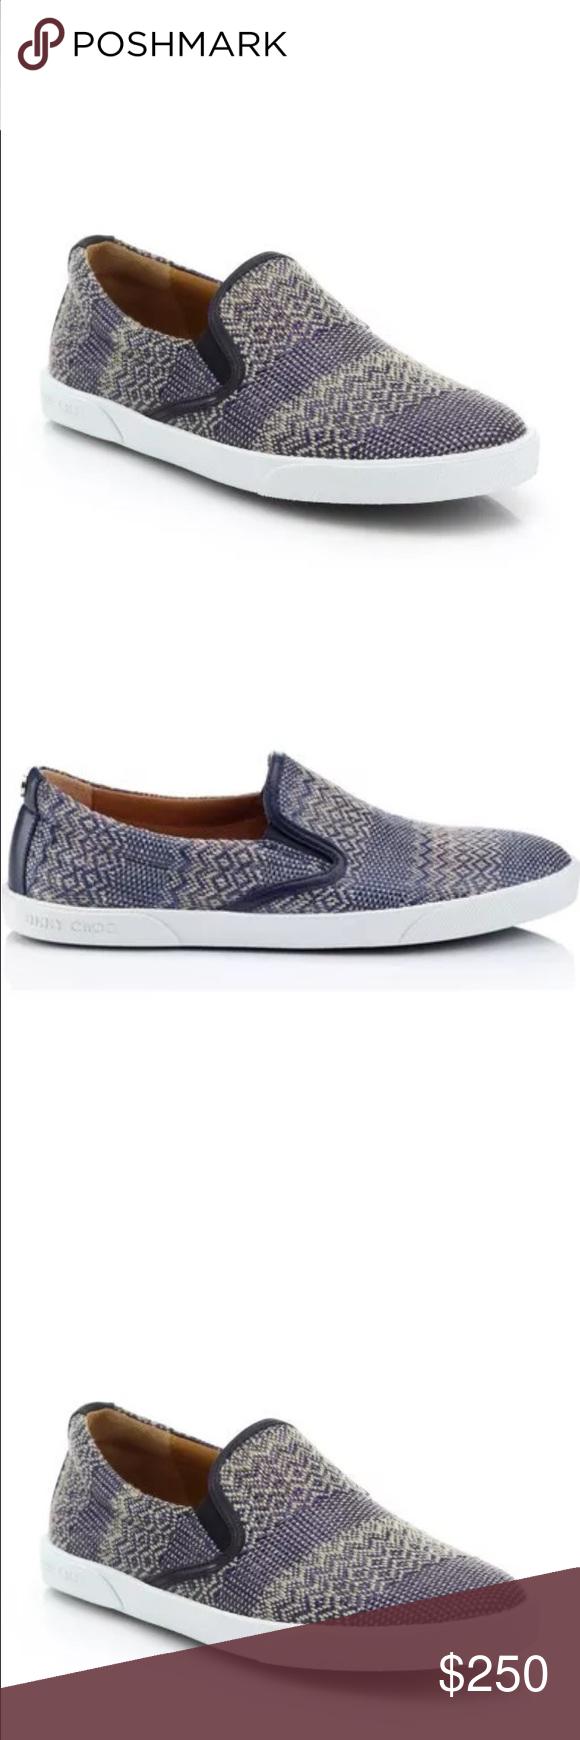 63eac864a23e Jimmy Choo Woven Fabric Slip On Sneakers 9.5 39.5 NIB JIMMY CHOO Demi Woven  Fabric Slip